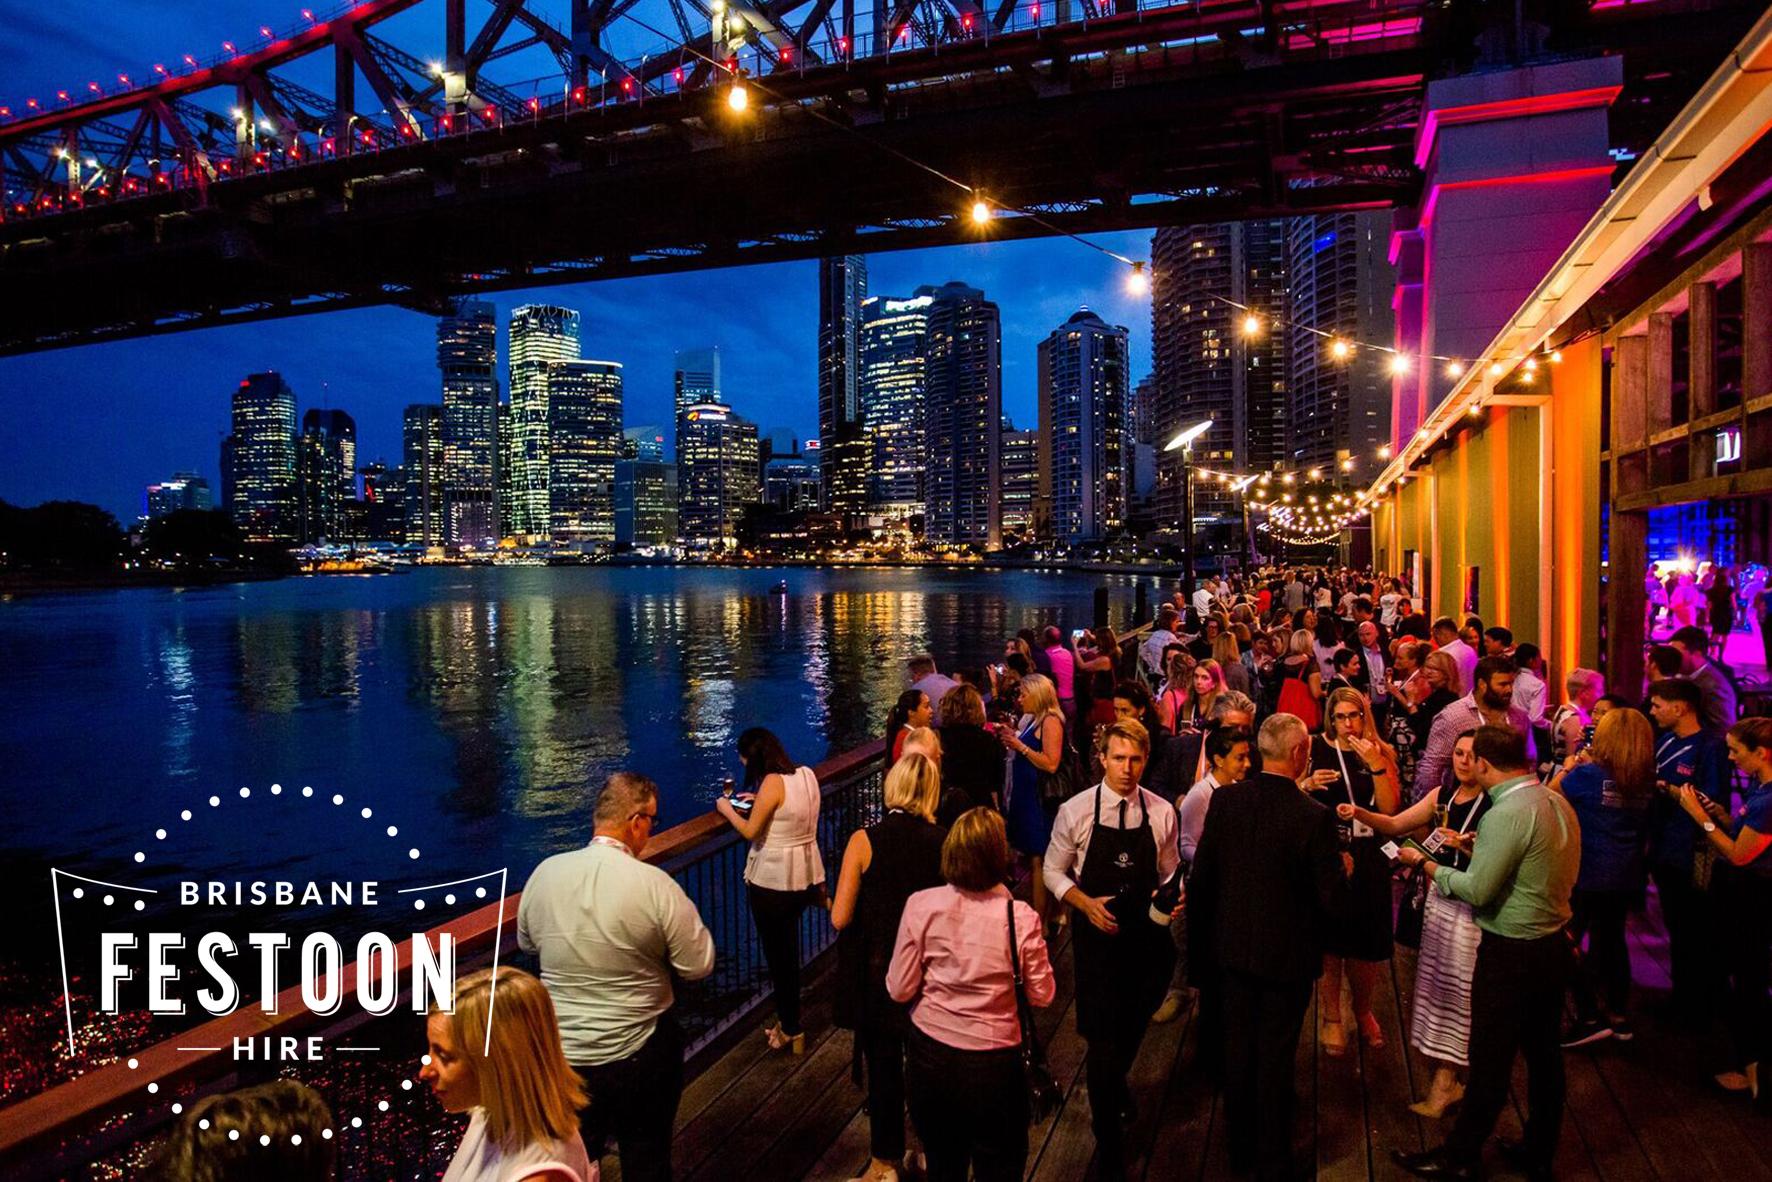 Brisbane Festoon Hire - HSW 2.jpg